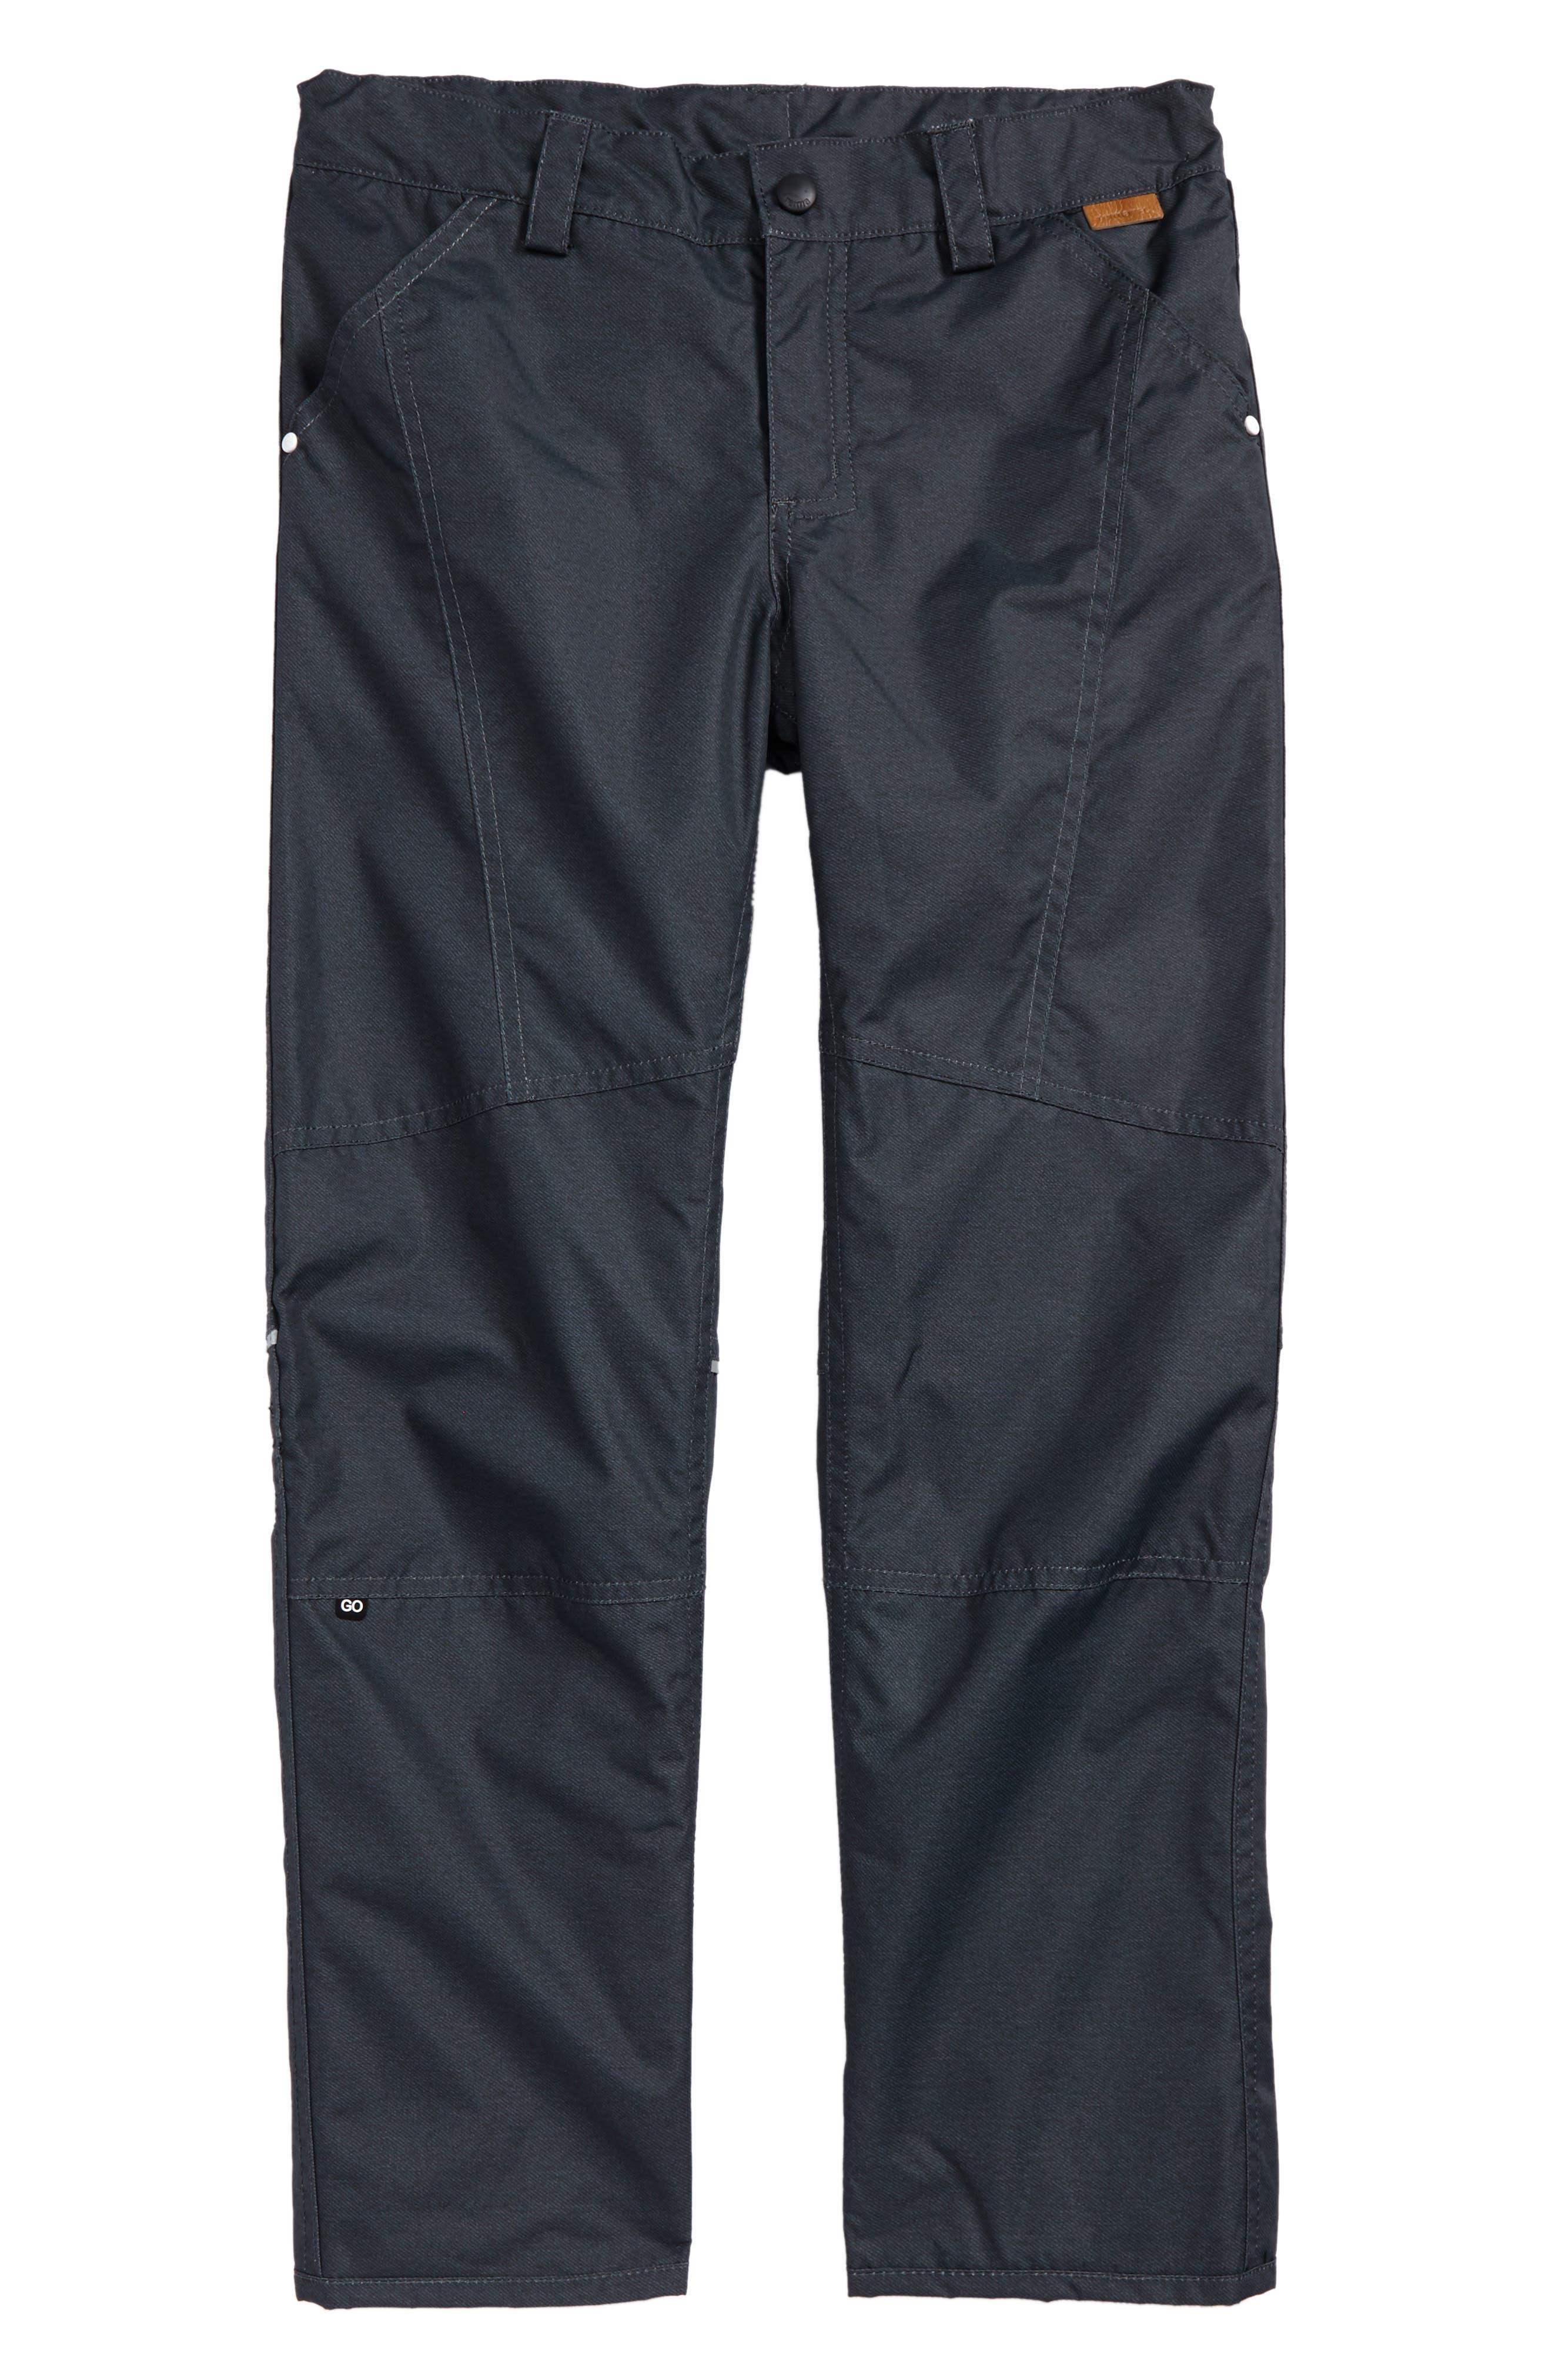 Reimatec<sup>®</sup> Waterproof Pants,                             Main thumbnail 1, color,